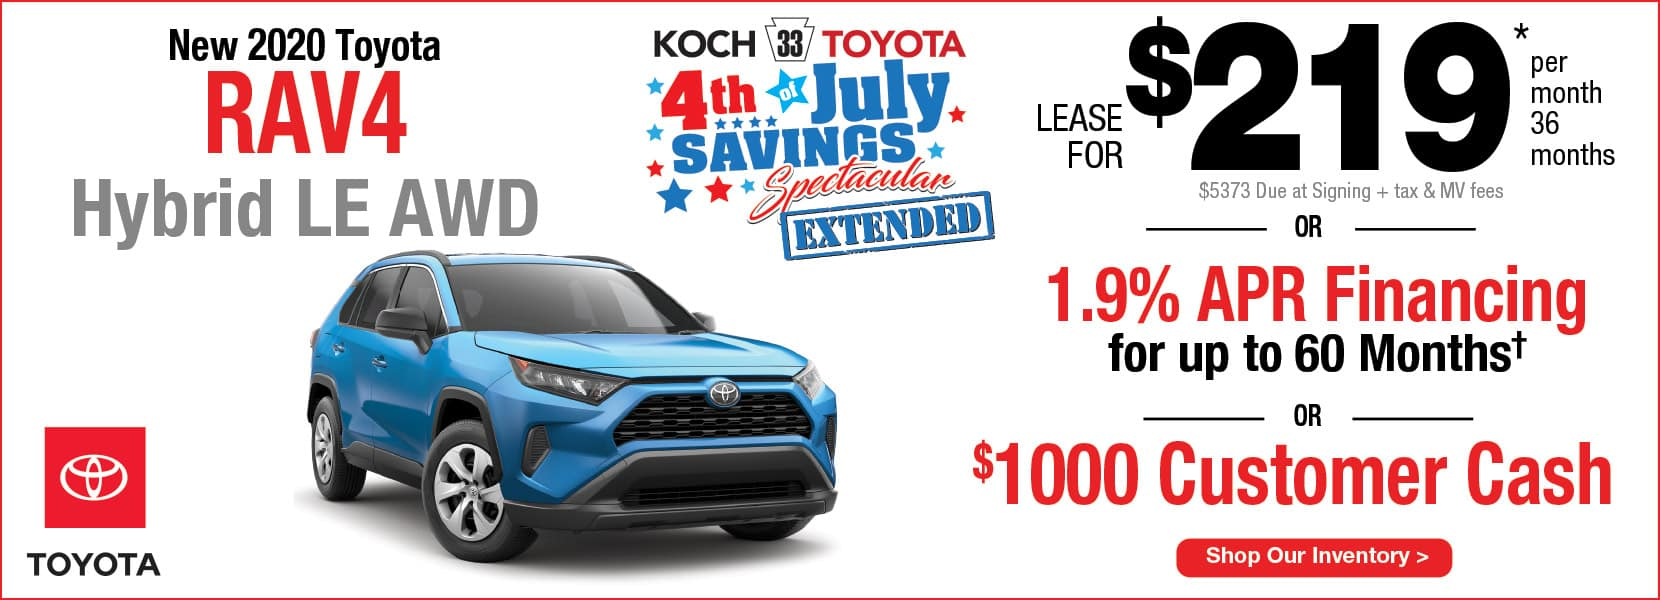 New 2020 Toyota RAV4 Hybrid Lease Koch 33 Toyota Easton PA